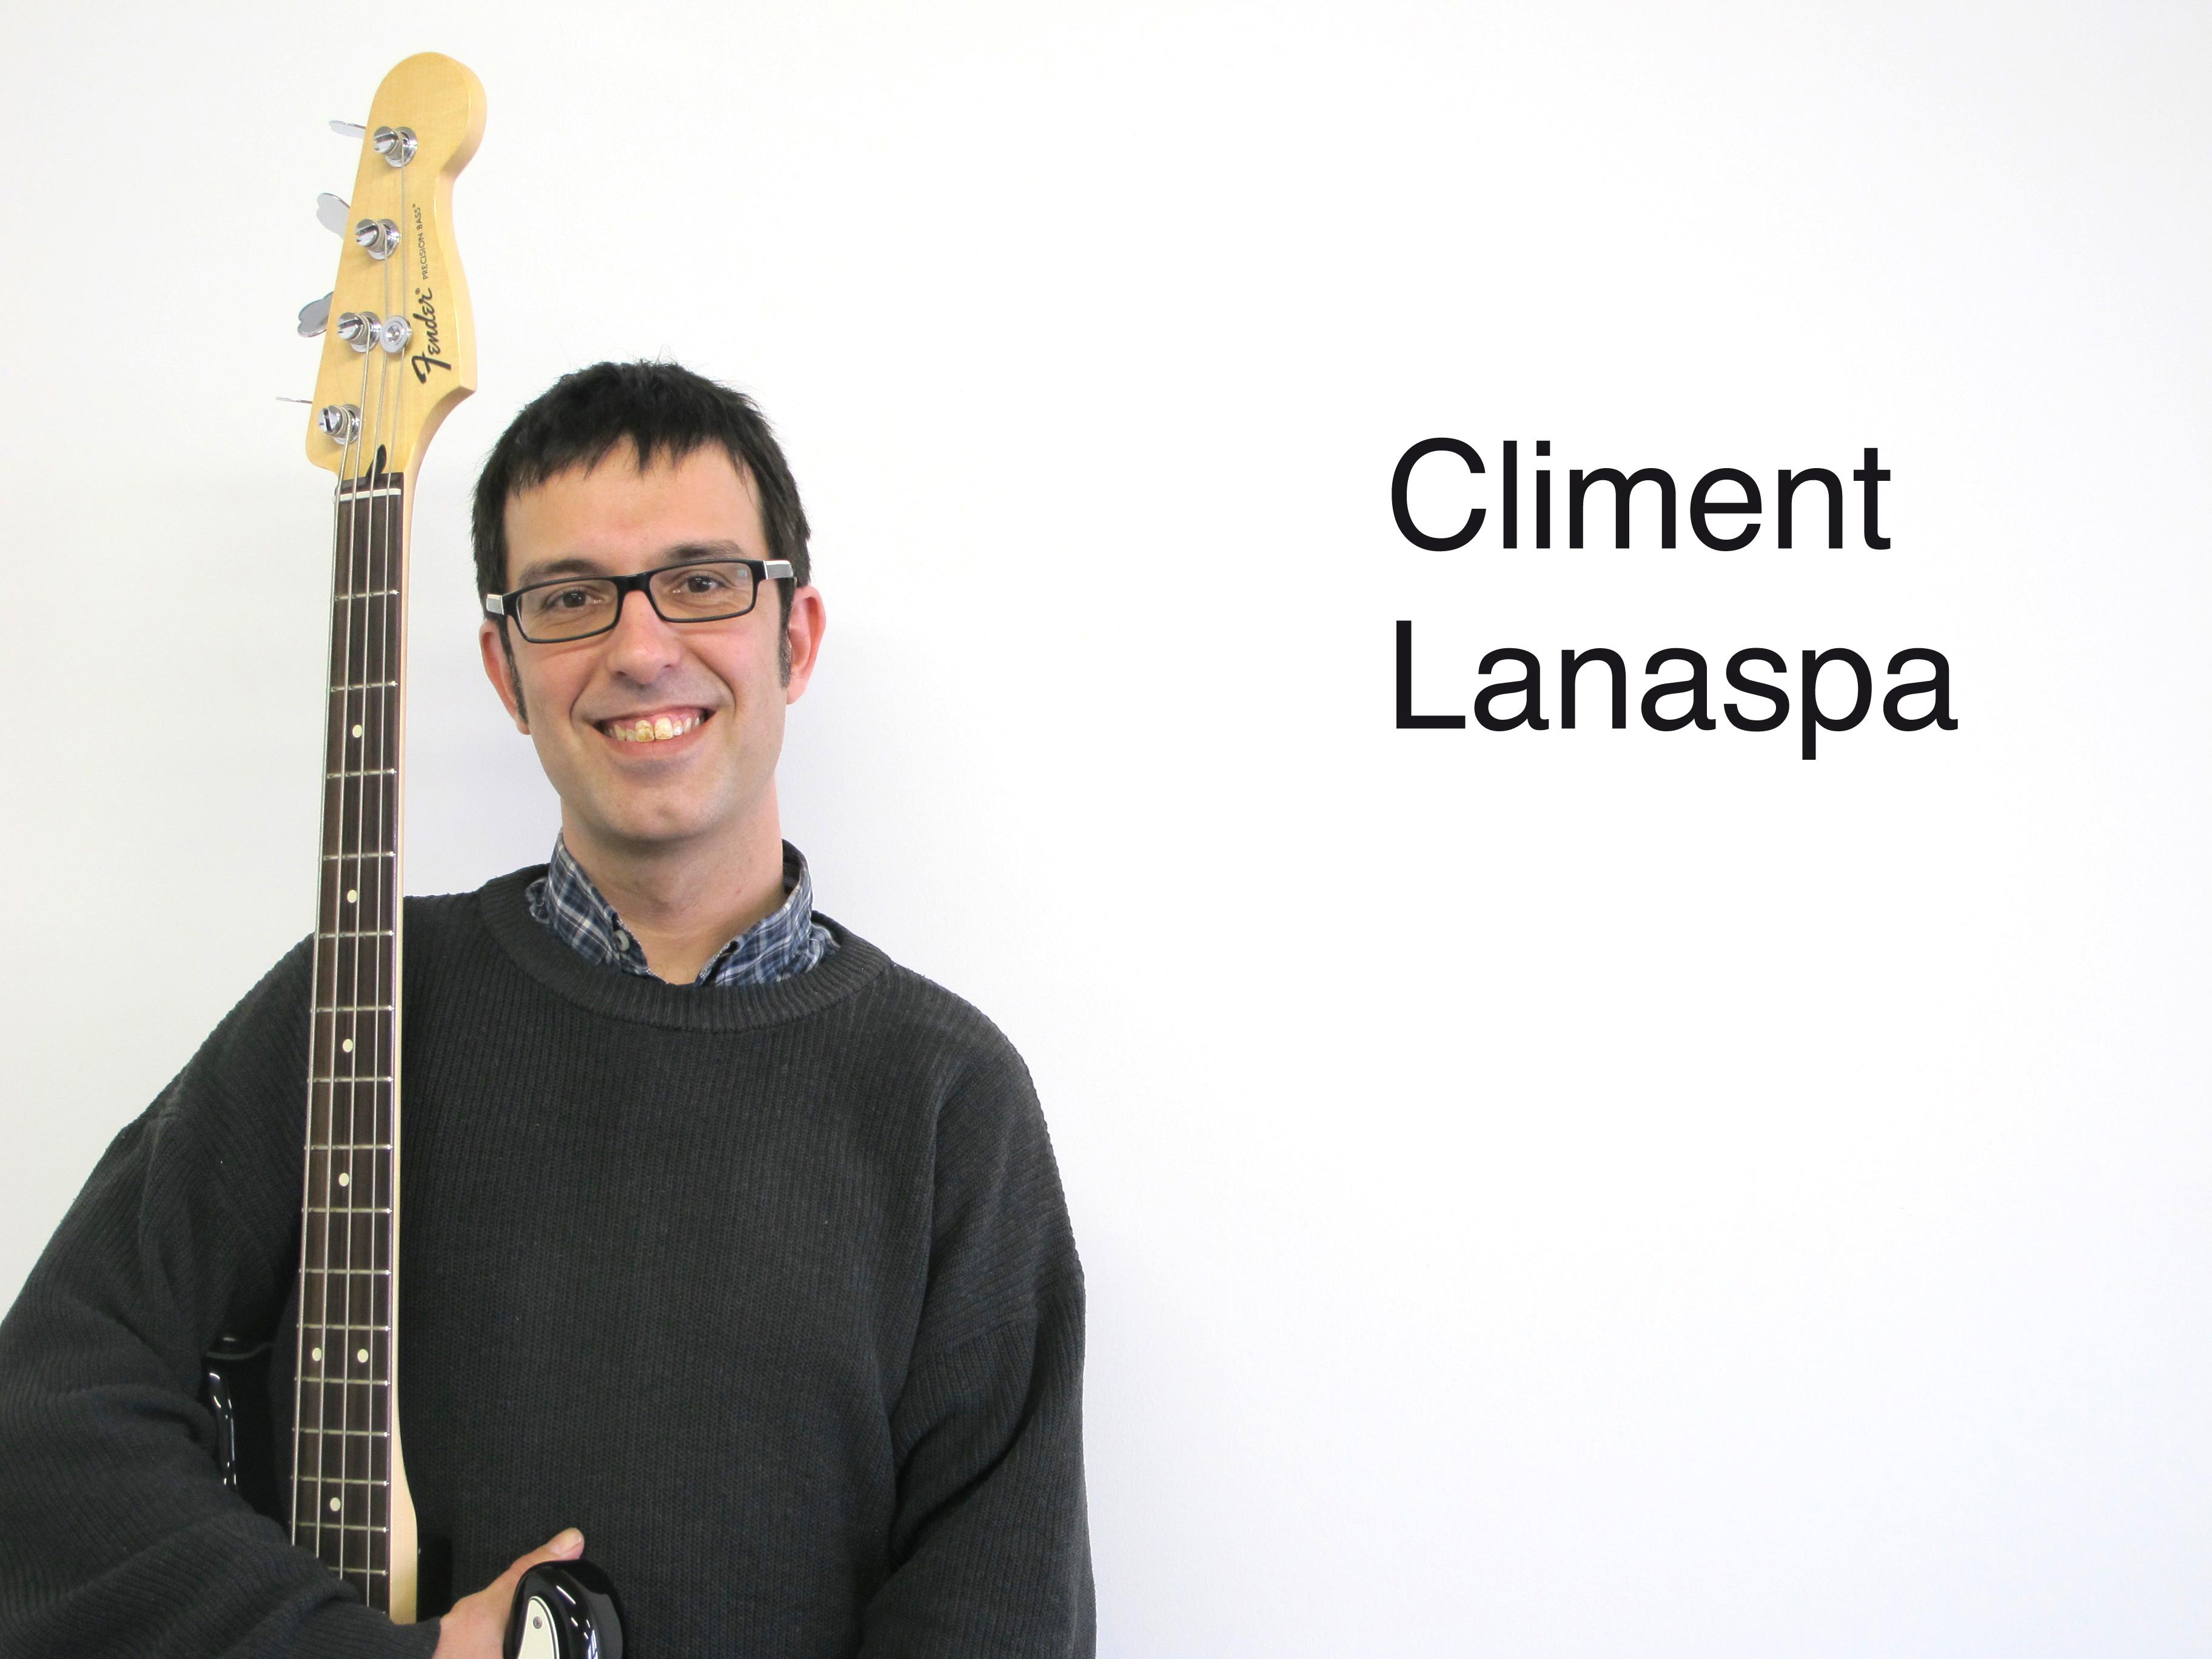 Climent Lanaspa